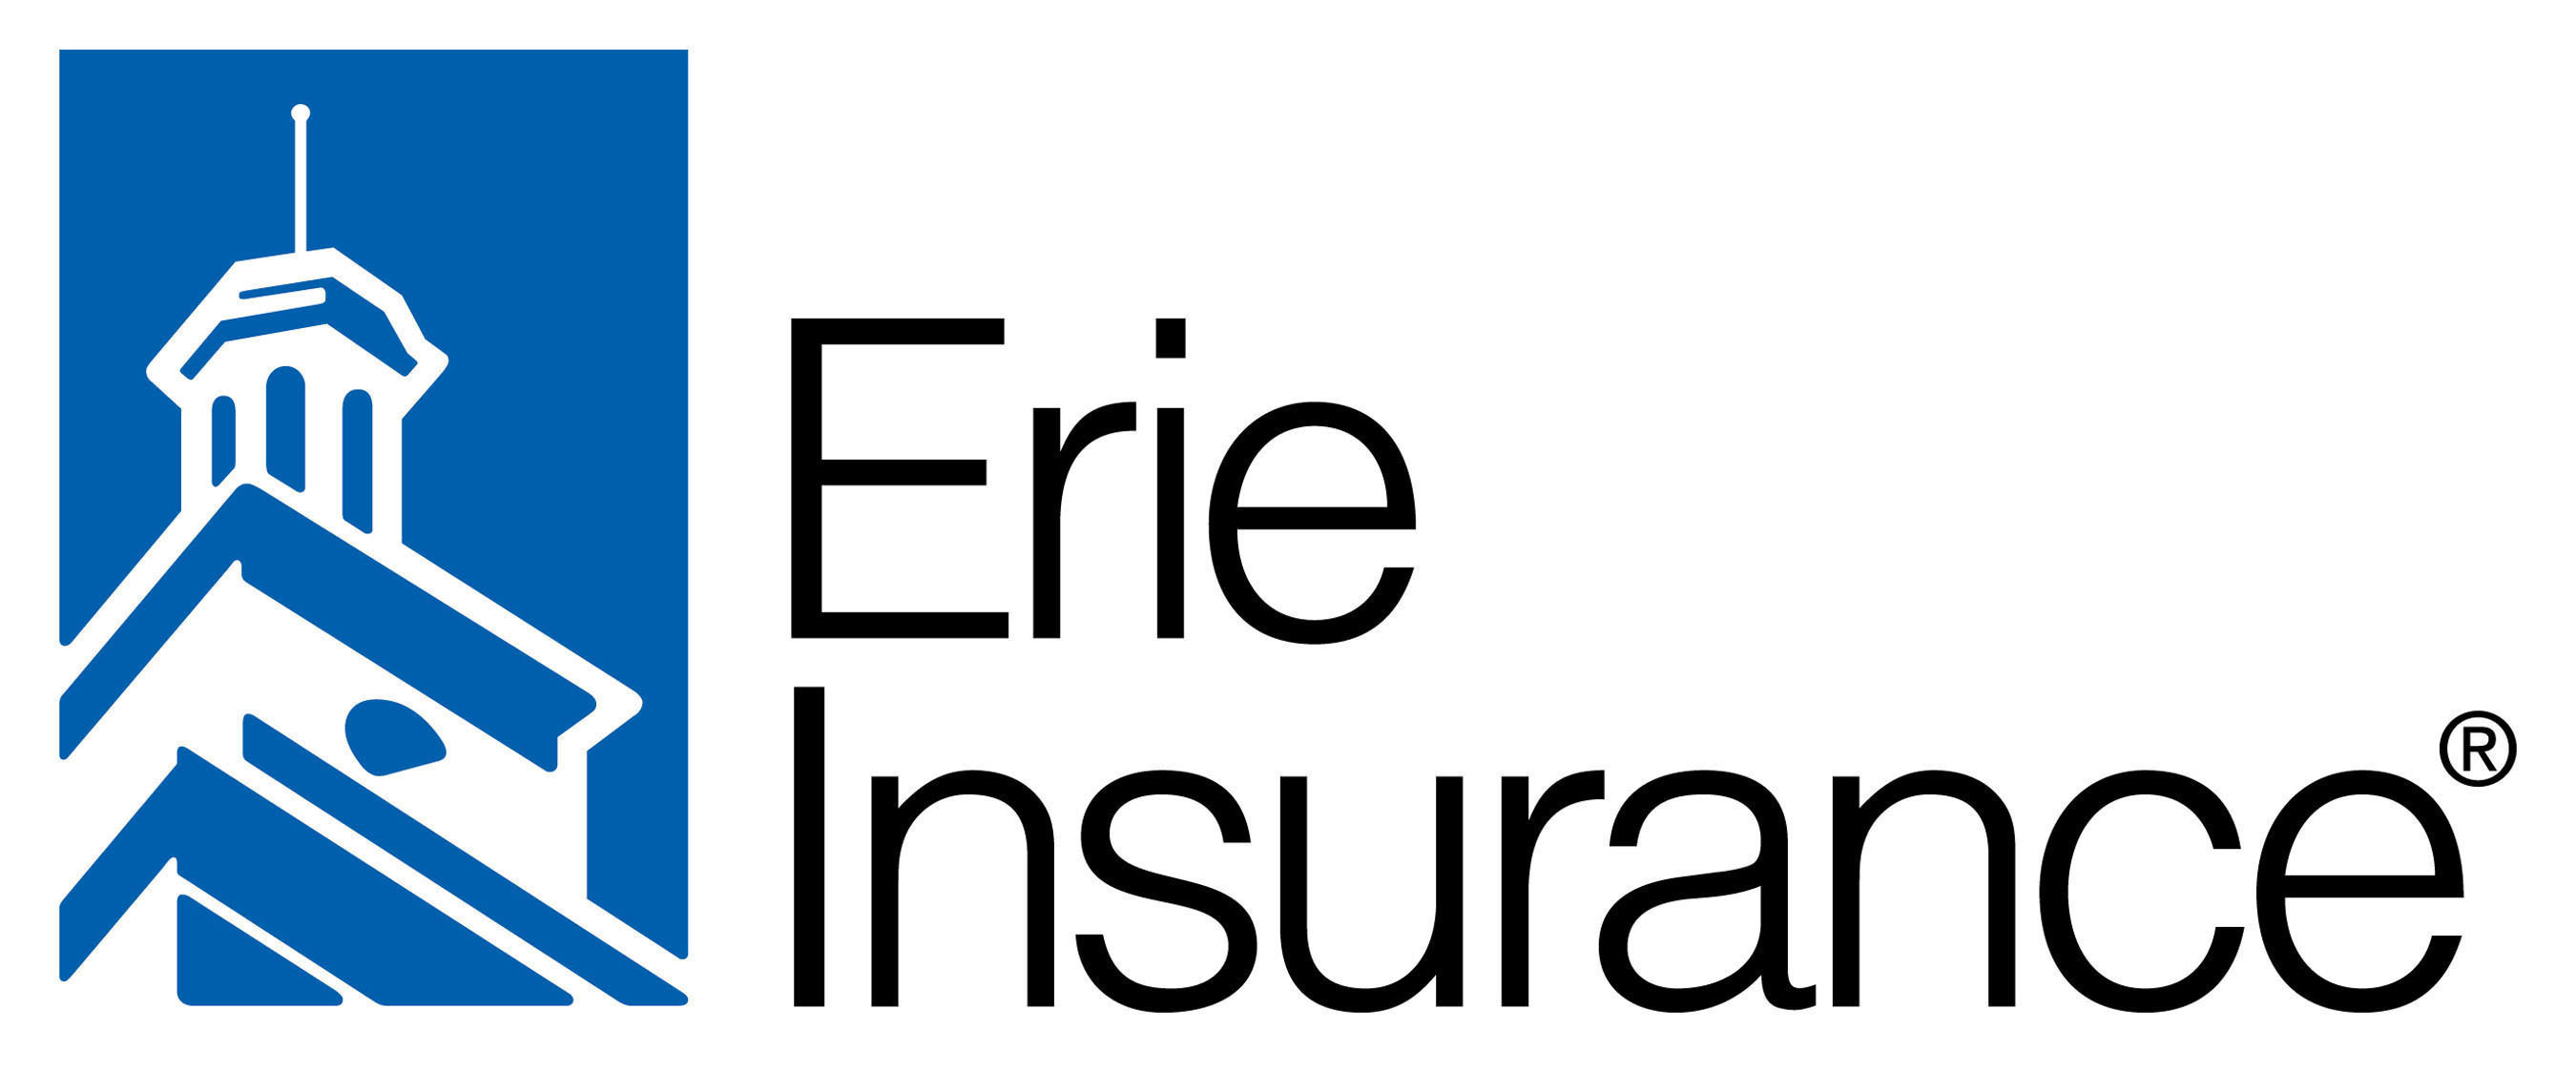 Erie Insurance Makes 2015 Fortune 500 List